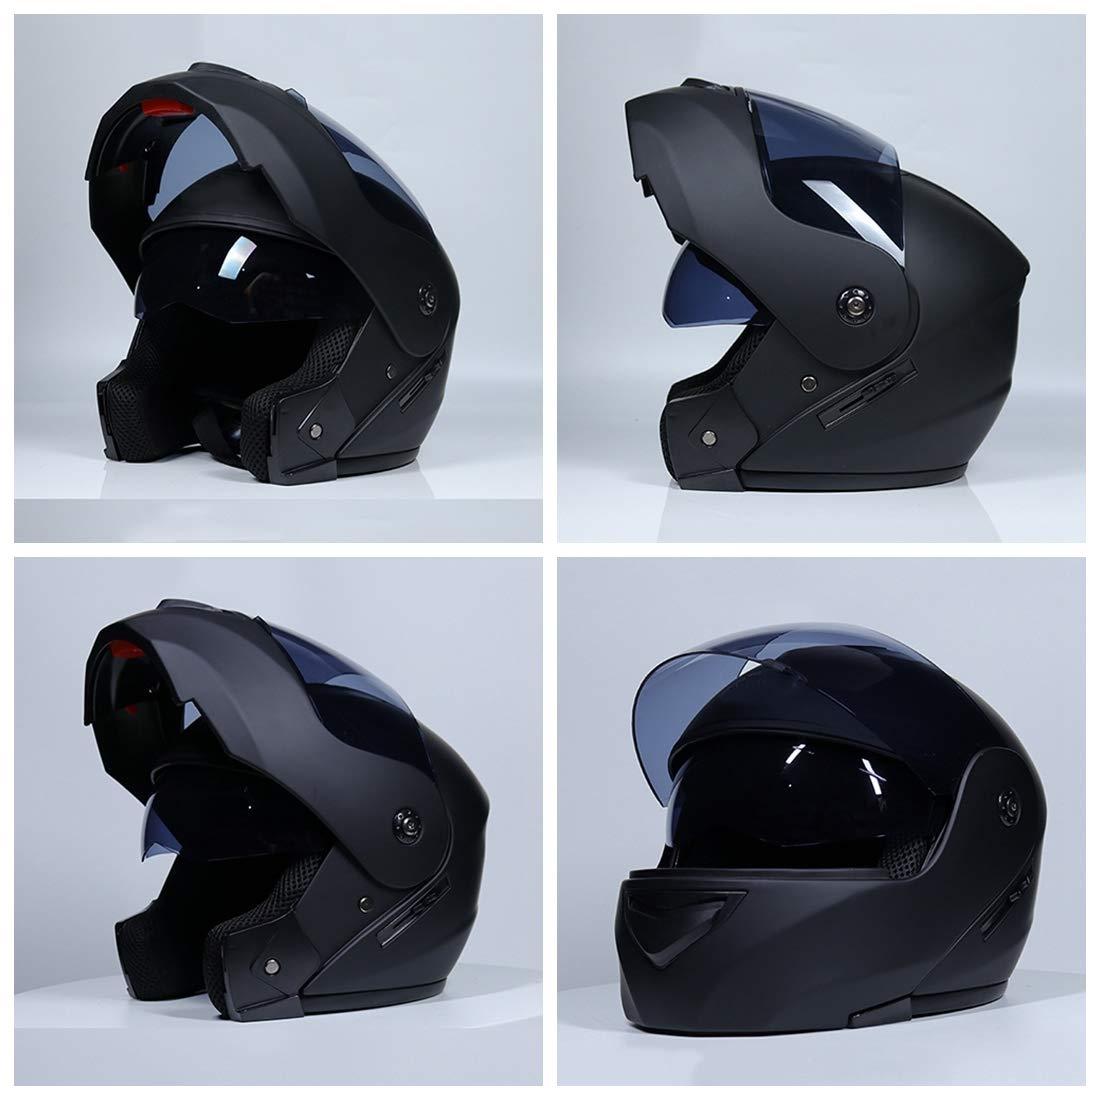 Offroad-Helm Vollgesichts Racing Style D/ämpfung//Langlebig Motocross Erwachsene Unisex Motorradhelm Doppelscheibe Winddicht//Sto/ßfest//Anti-UV,Black,S